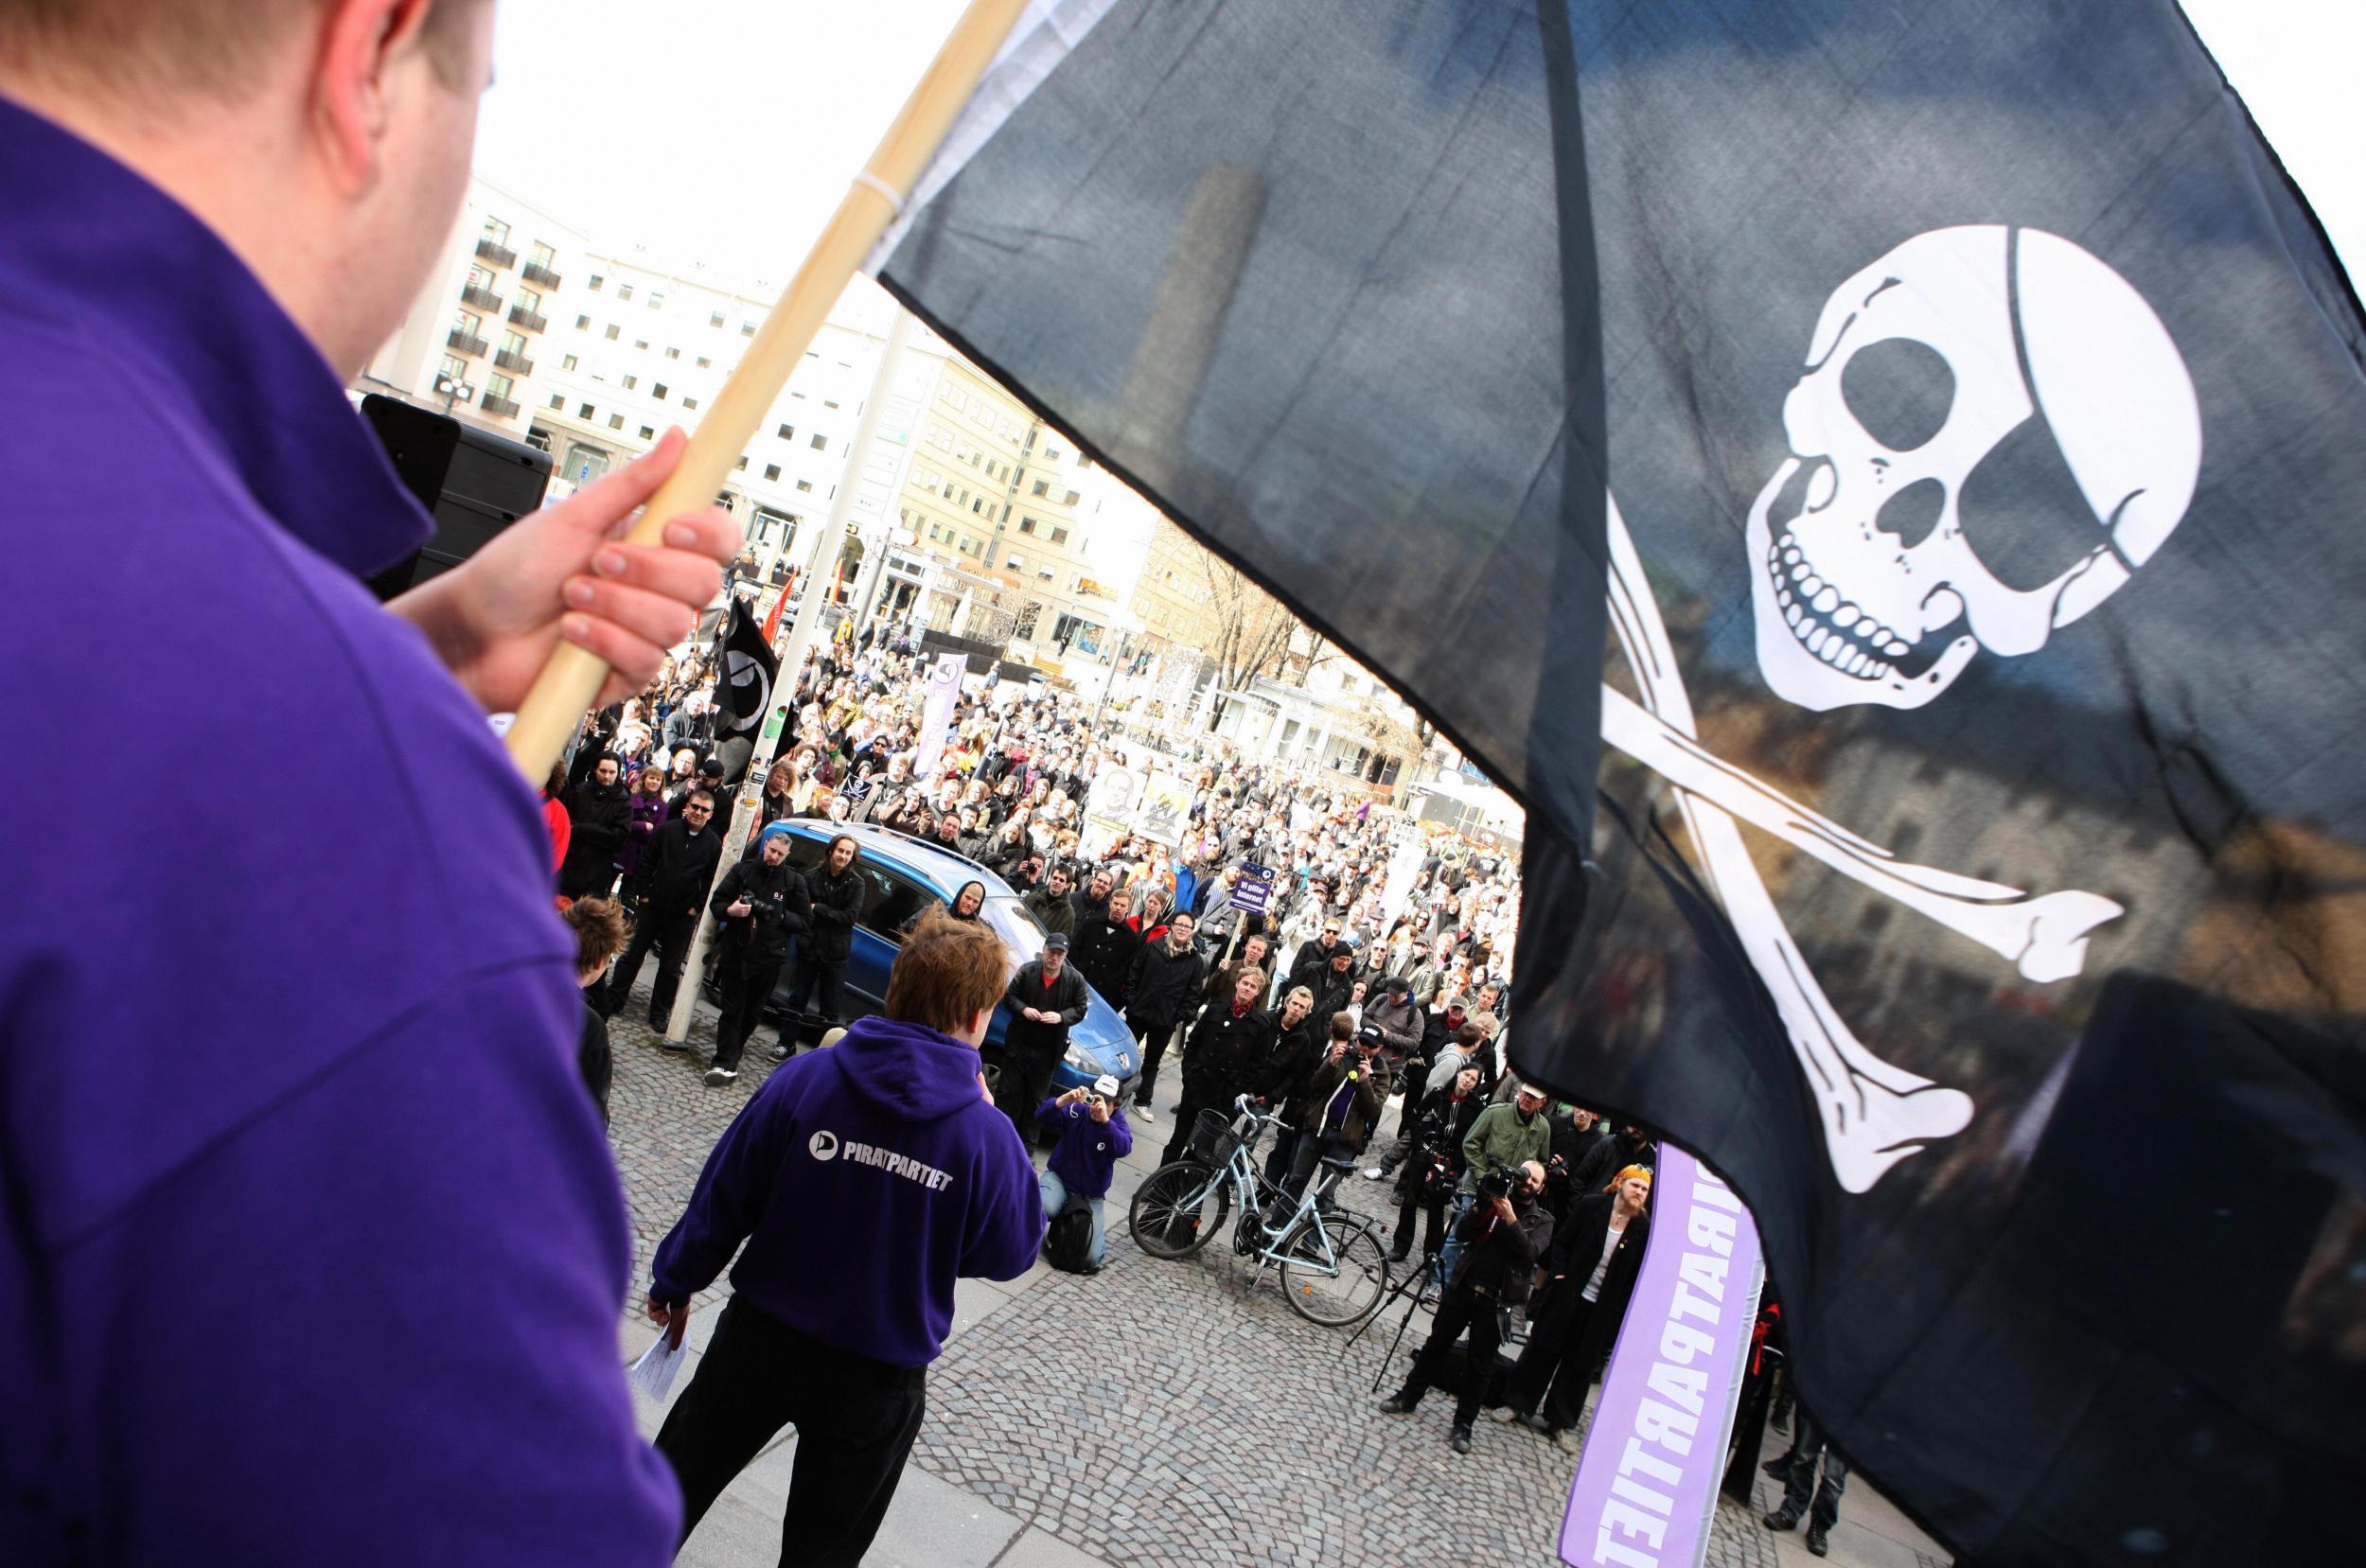 the piratebay sites